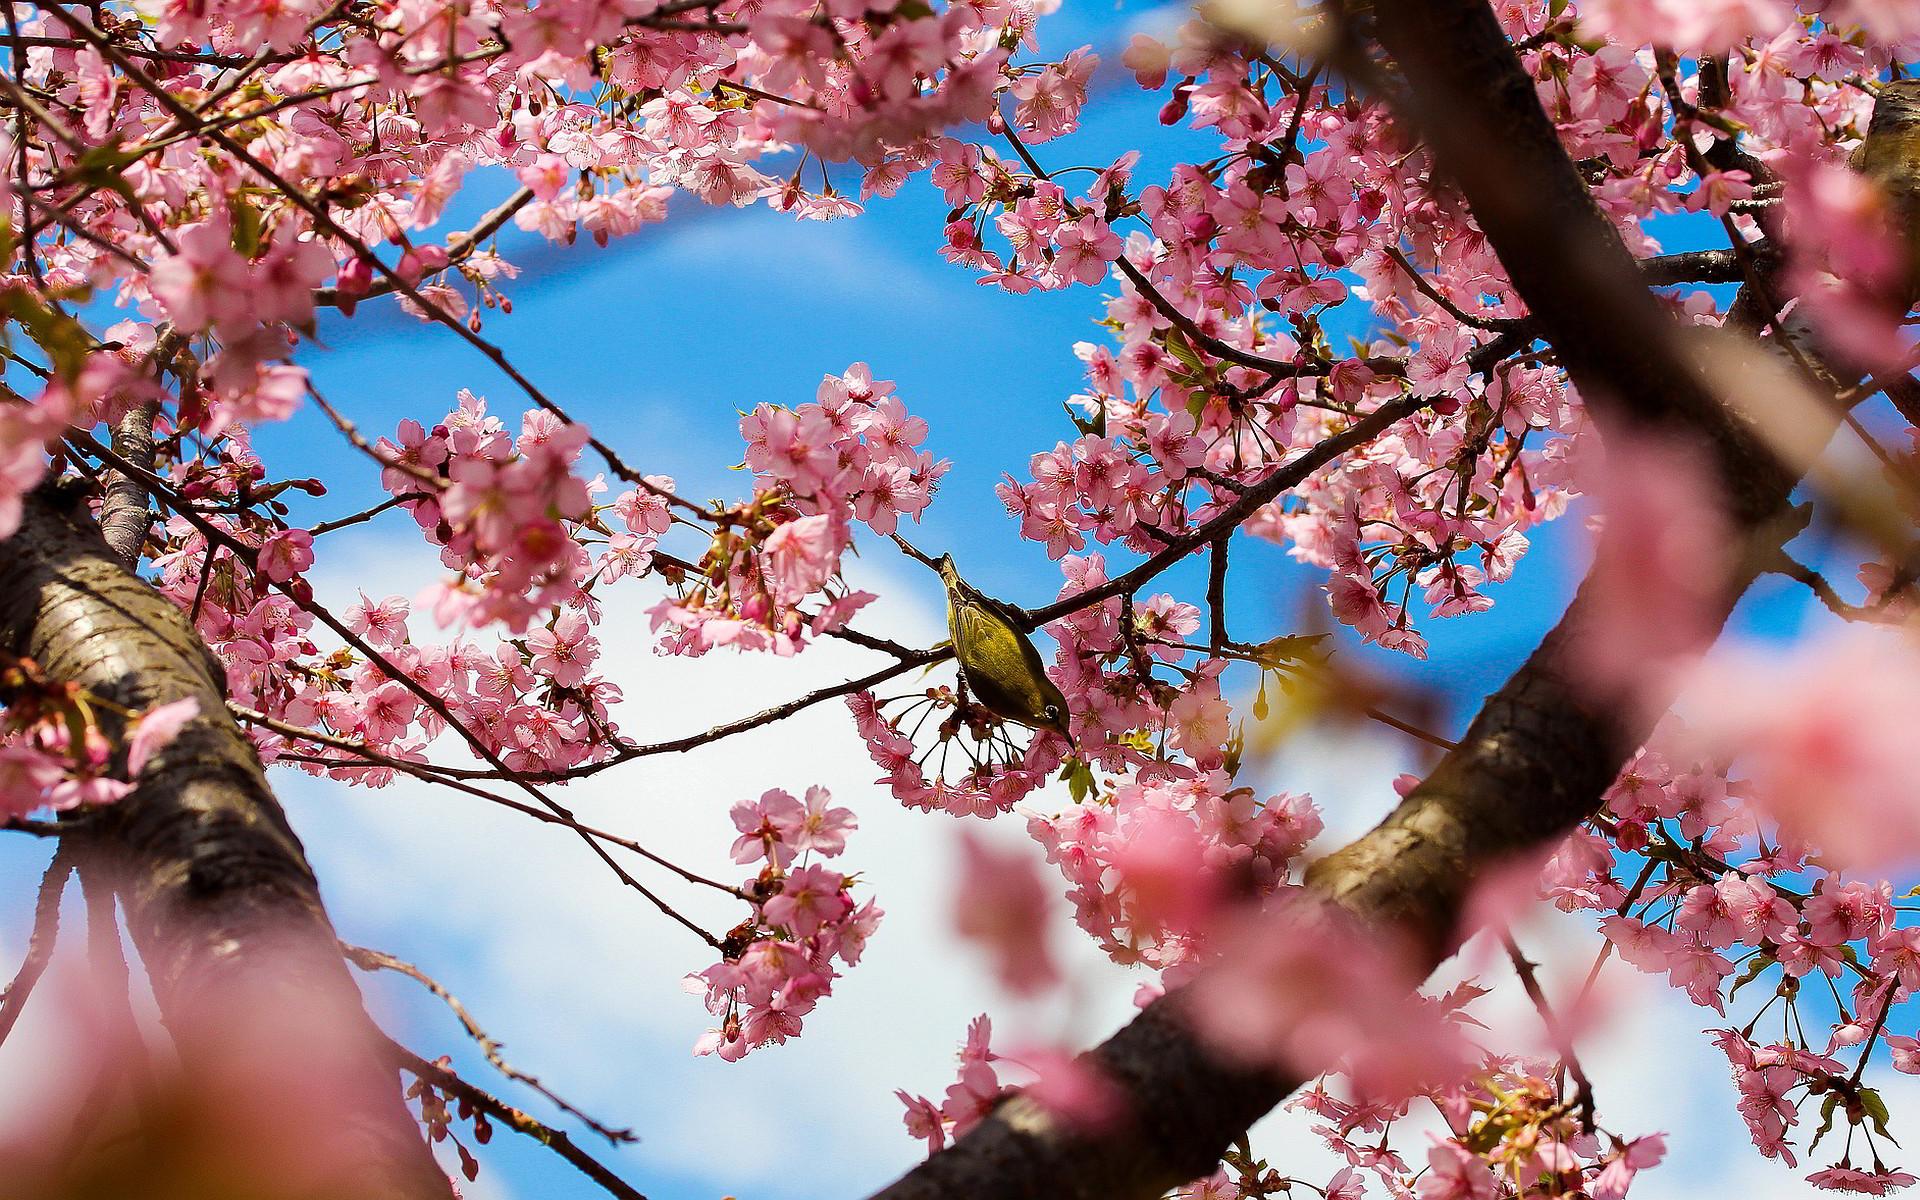 Spring desktop wallpapers backgrounds 65 images - Free computer backgrounds for spring ...